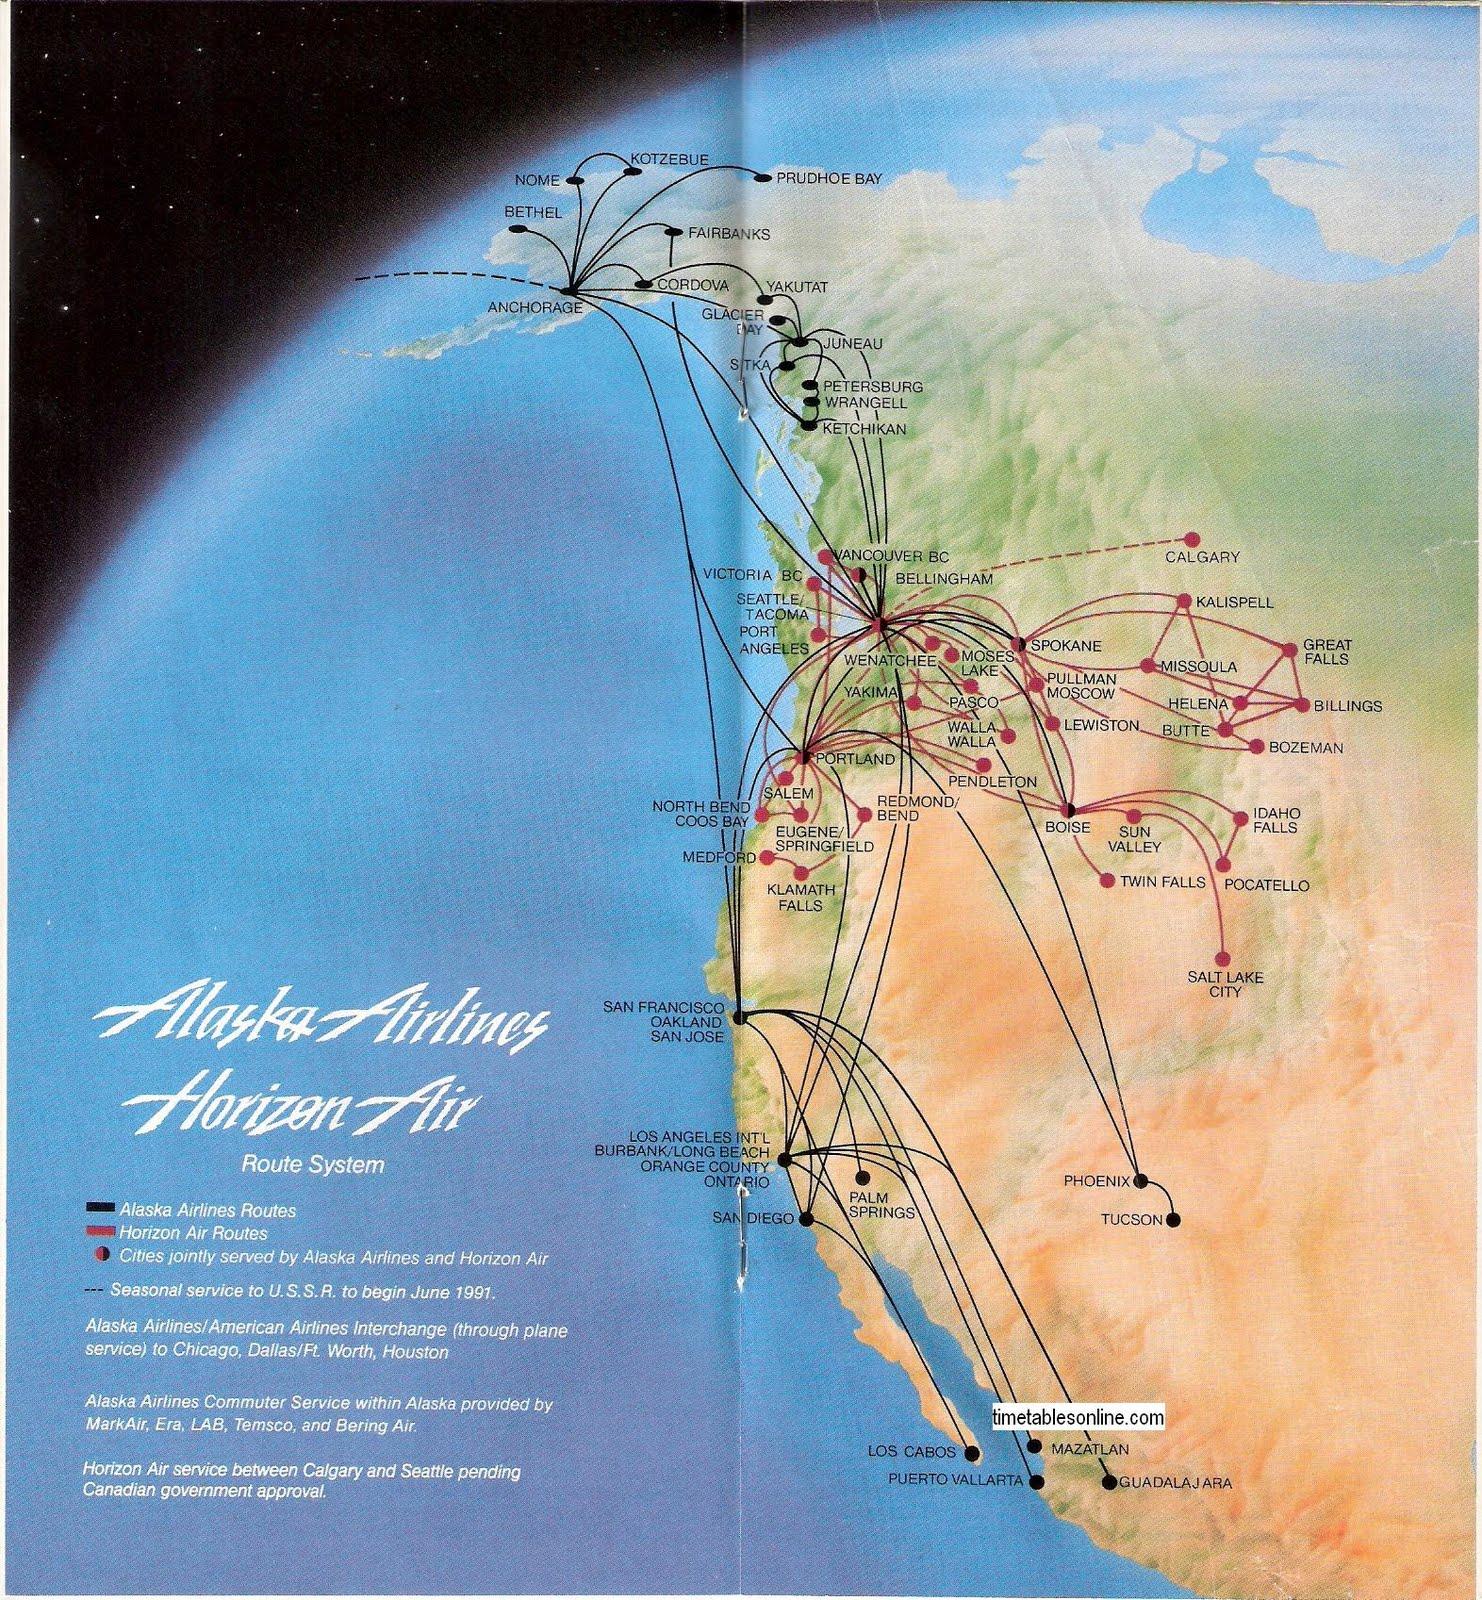 Airline Timetables: Alaska Airlines - June, 1991